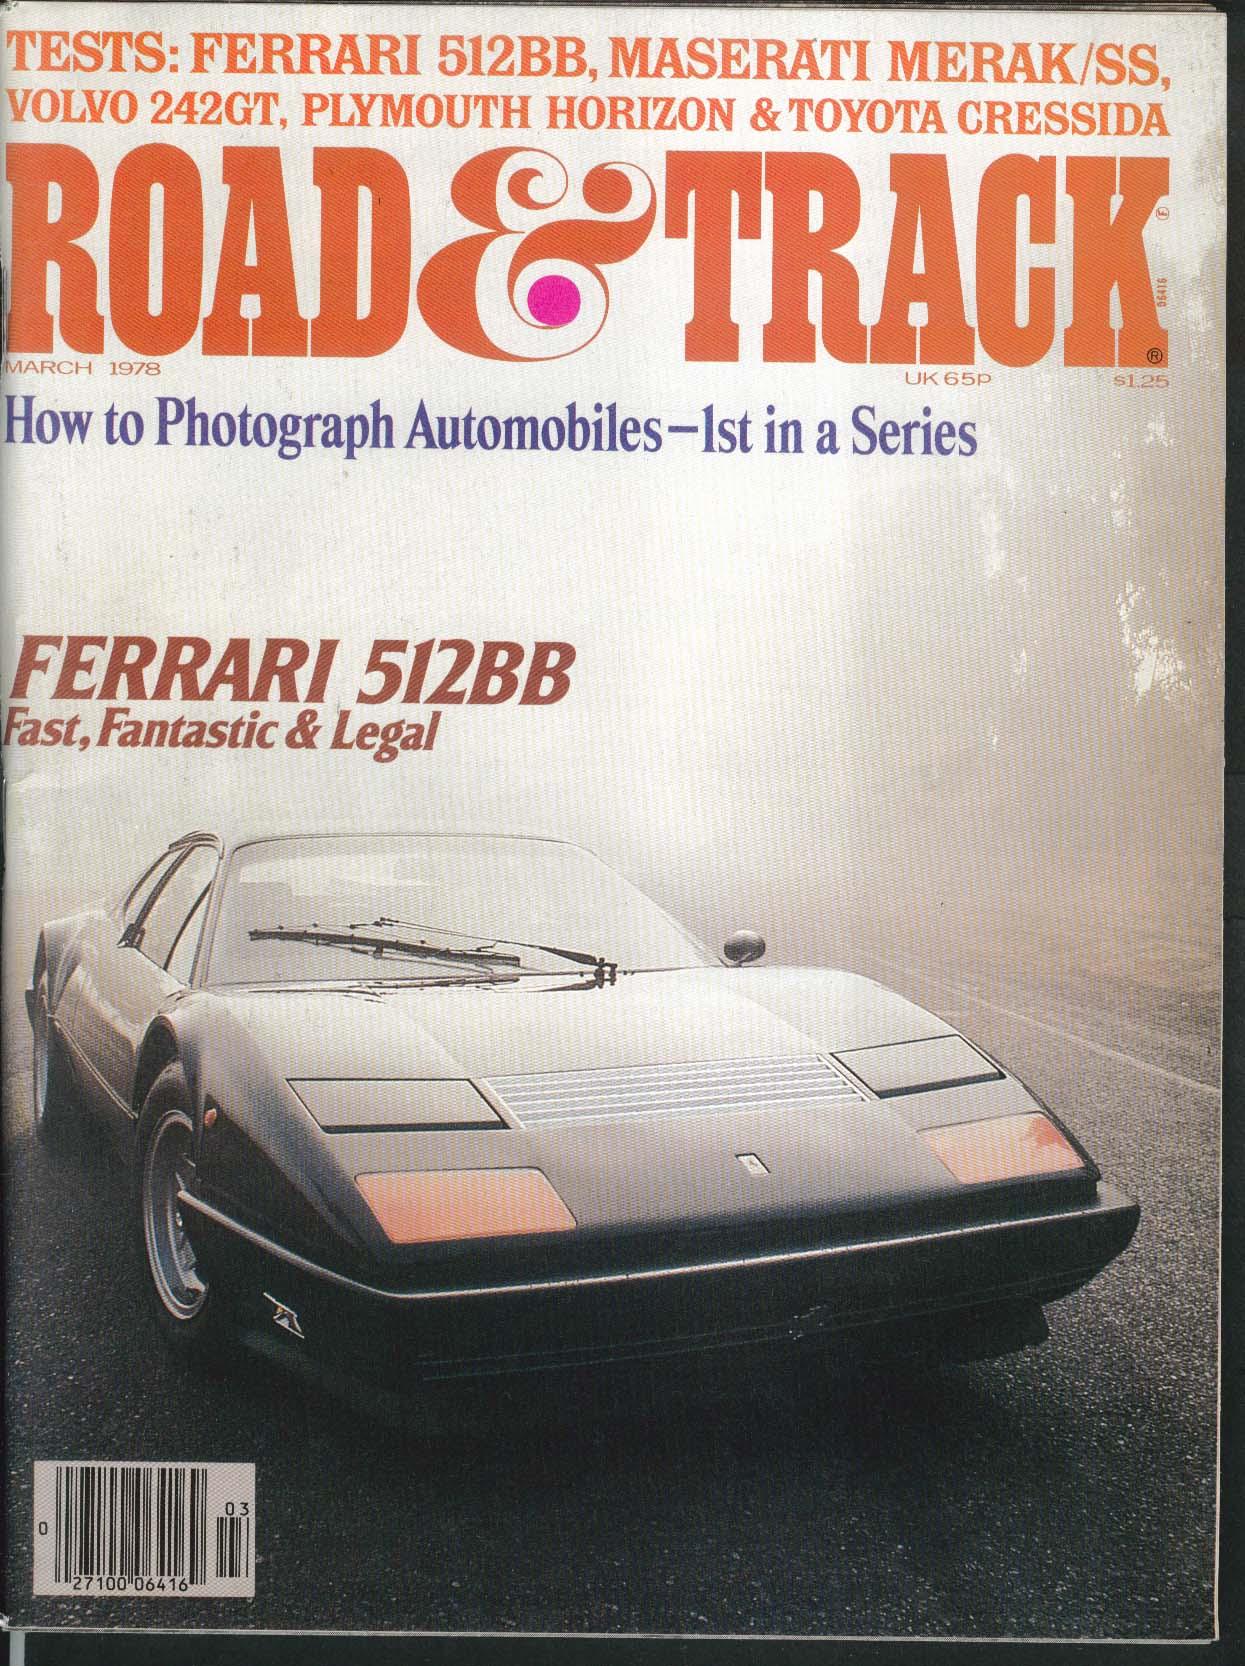 ROAD & TRACK Ferrari 512BB Maserati Merak/SS Volvo 242GT Toyota Cressida 3 1978